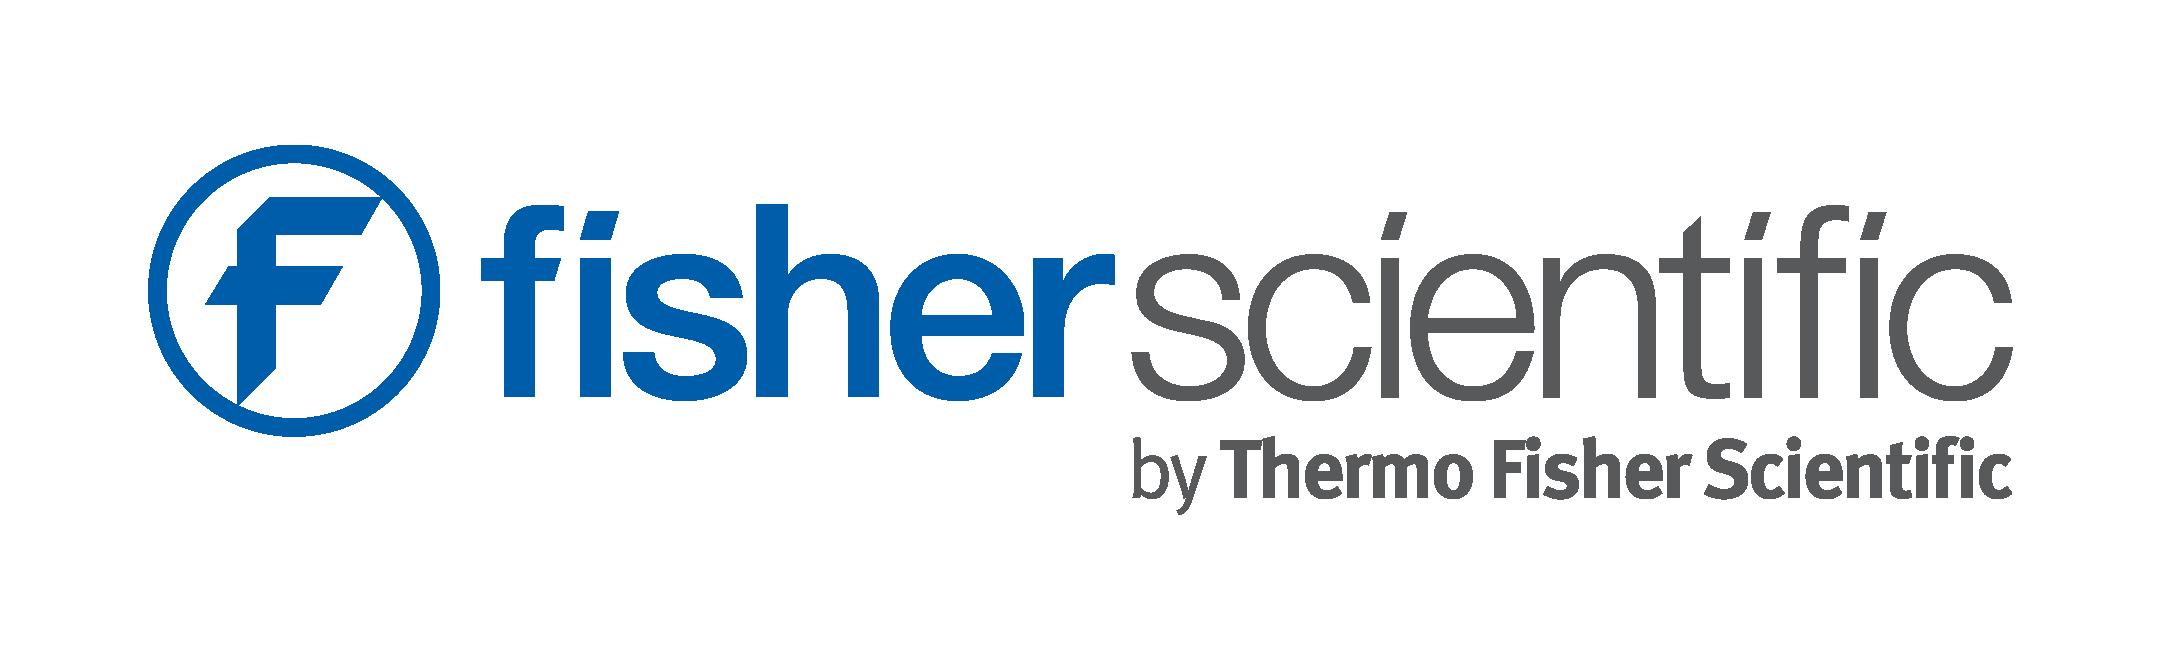 Benefit Highlights: Fisher Scientific - BioFlorida, Inc. Fisher Scientific